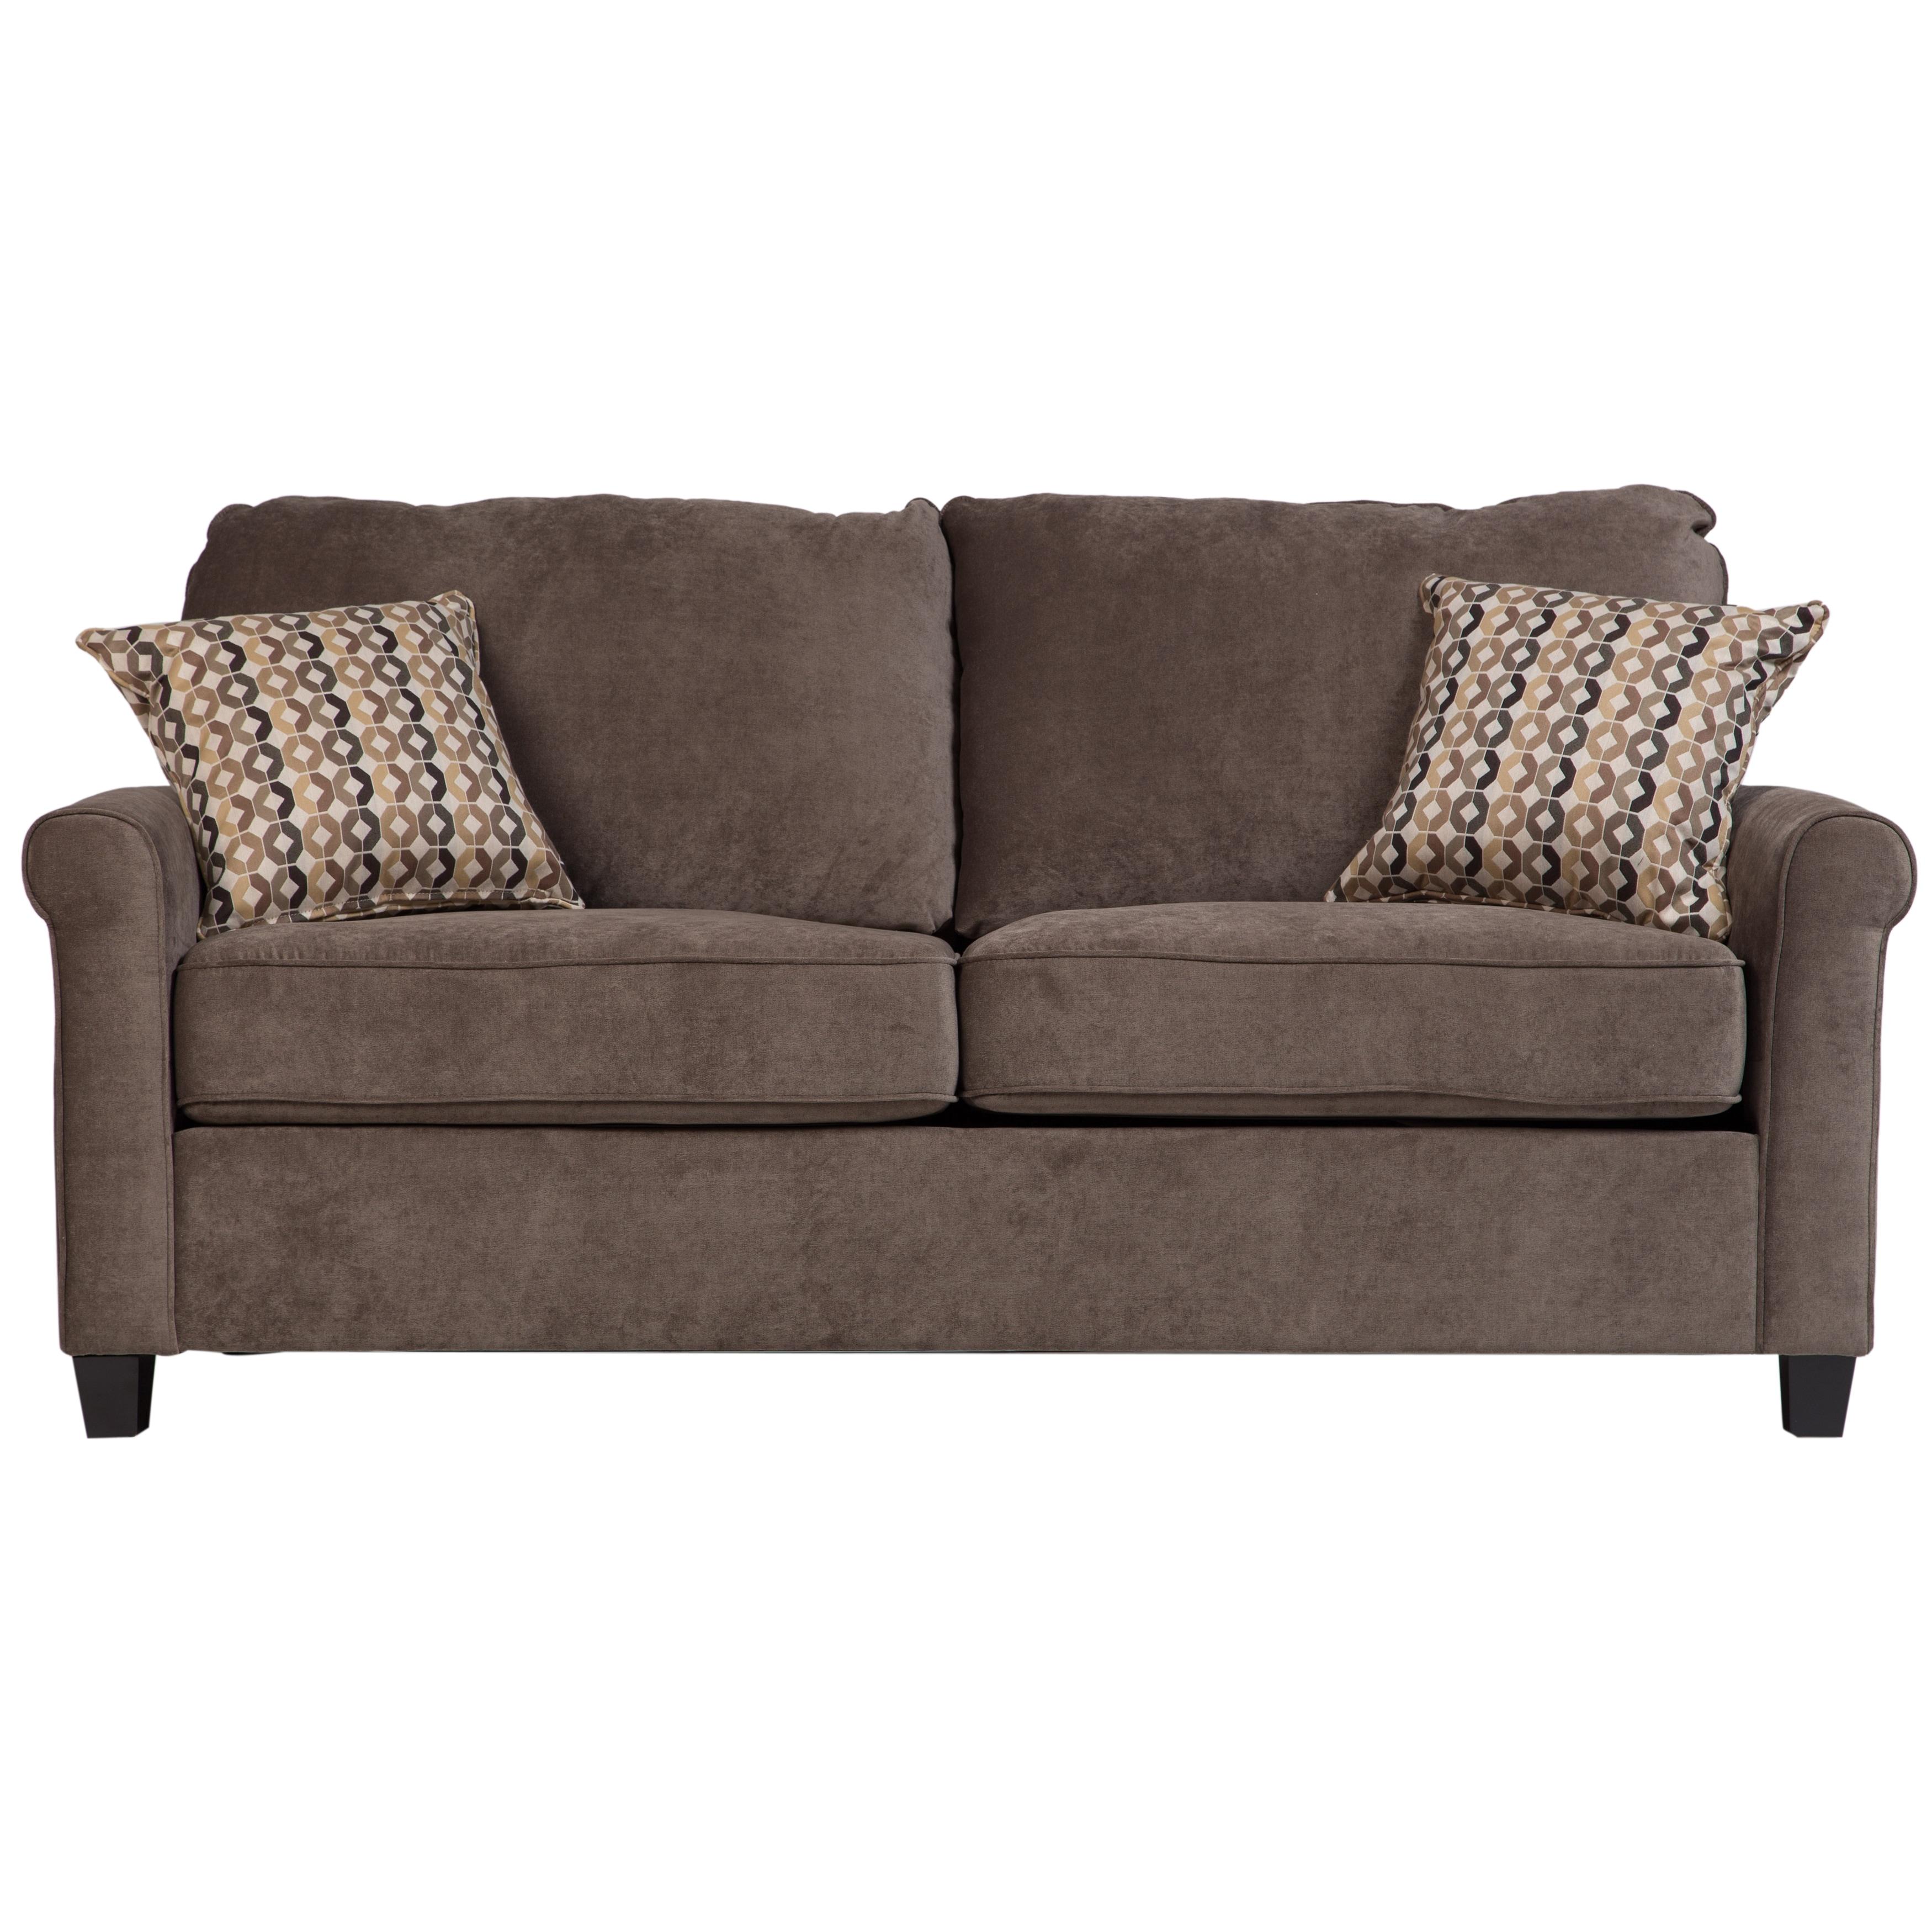 Porter Serena Warm Grey Full Sleeper Sofa with Woven Acce...